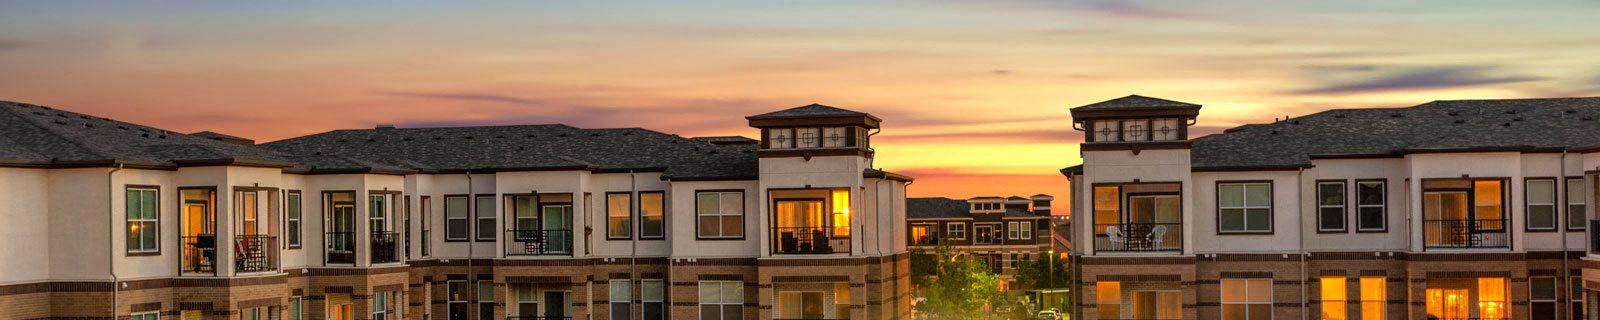 Elegant Exterior View at The Mansions McKinney, McKinney, 75070